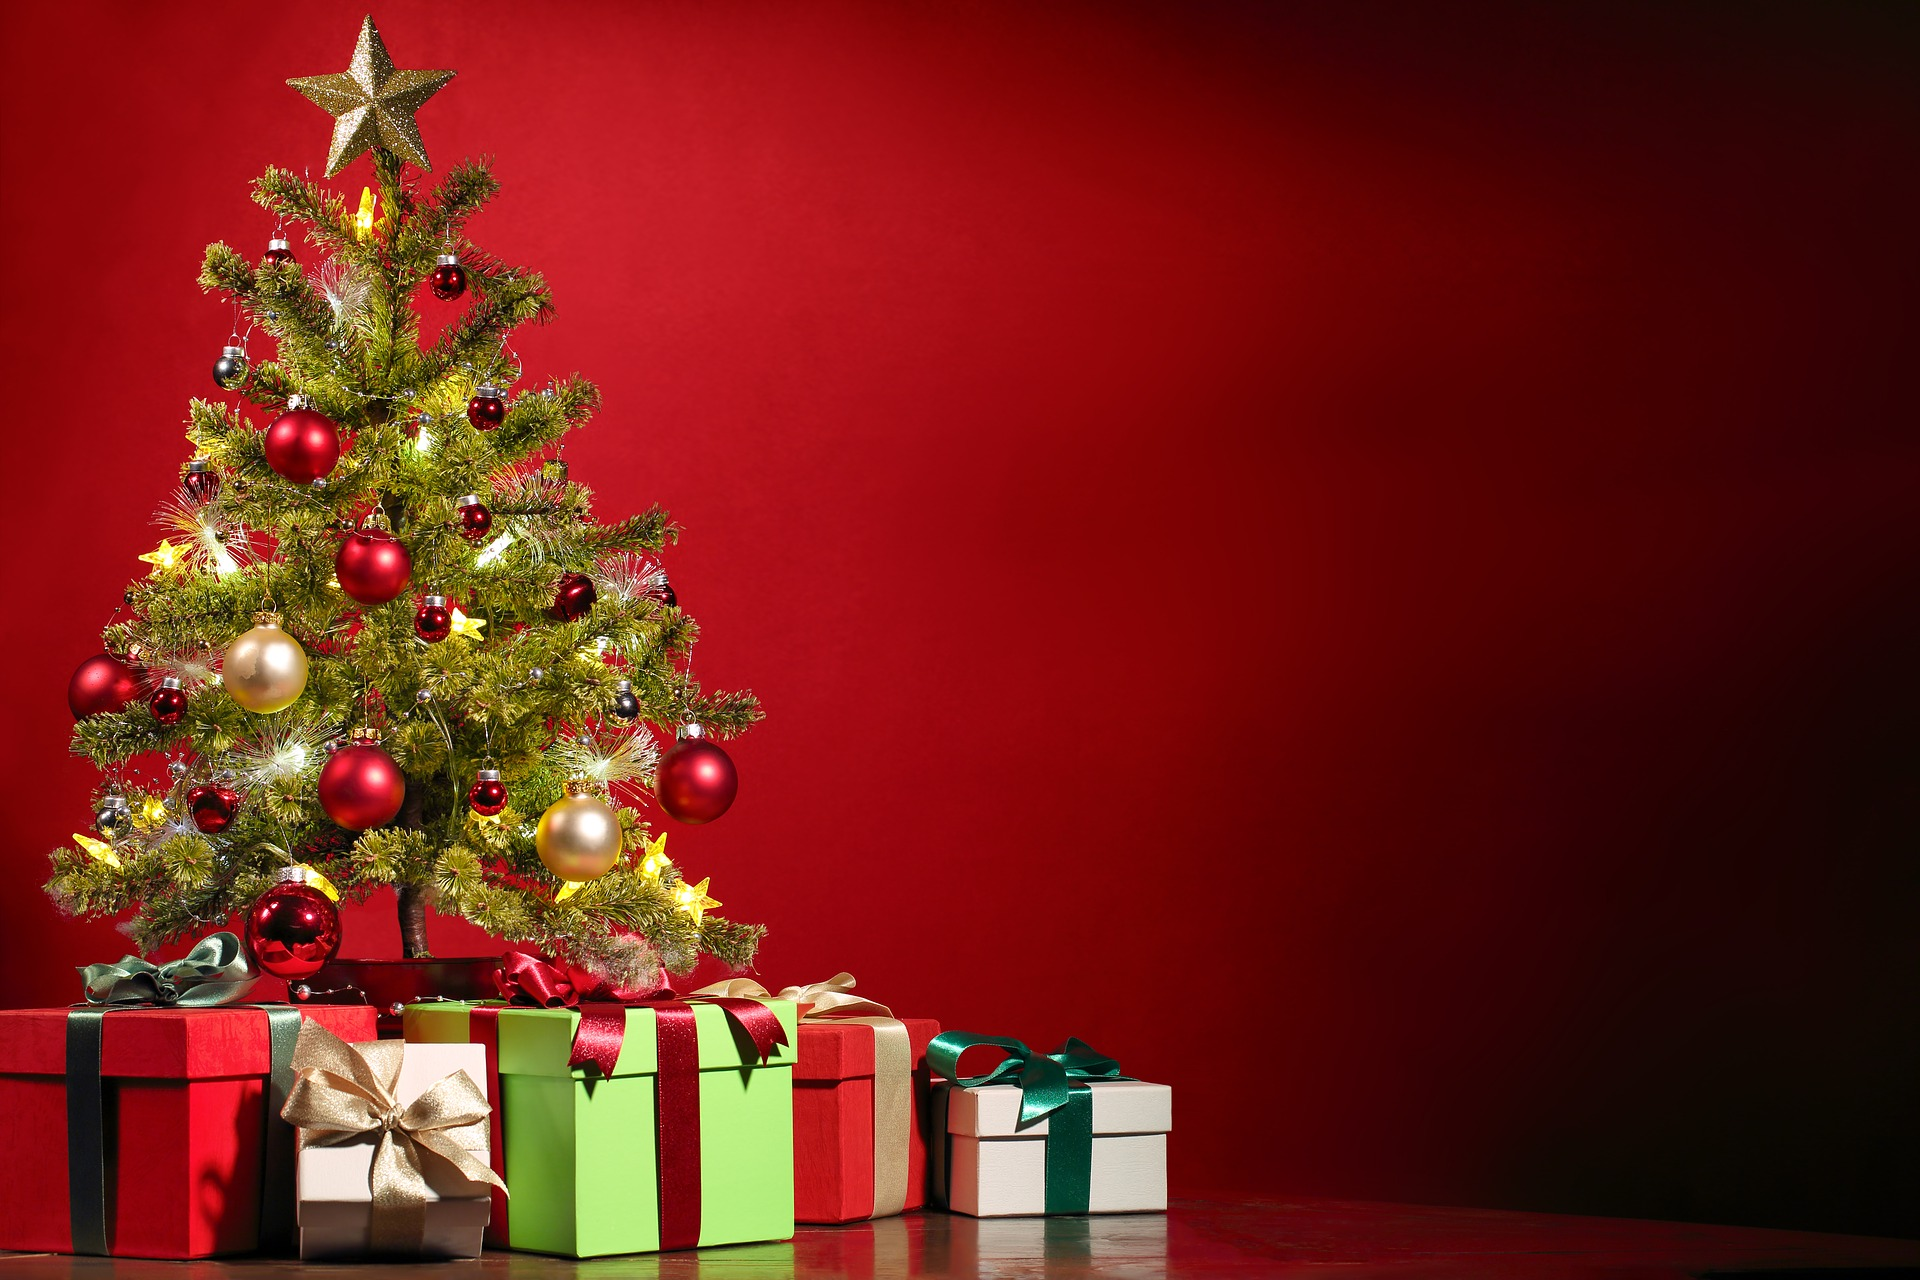 Feliz Navidad tester amiga/o